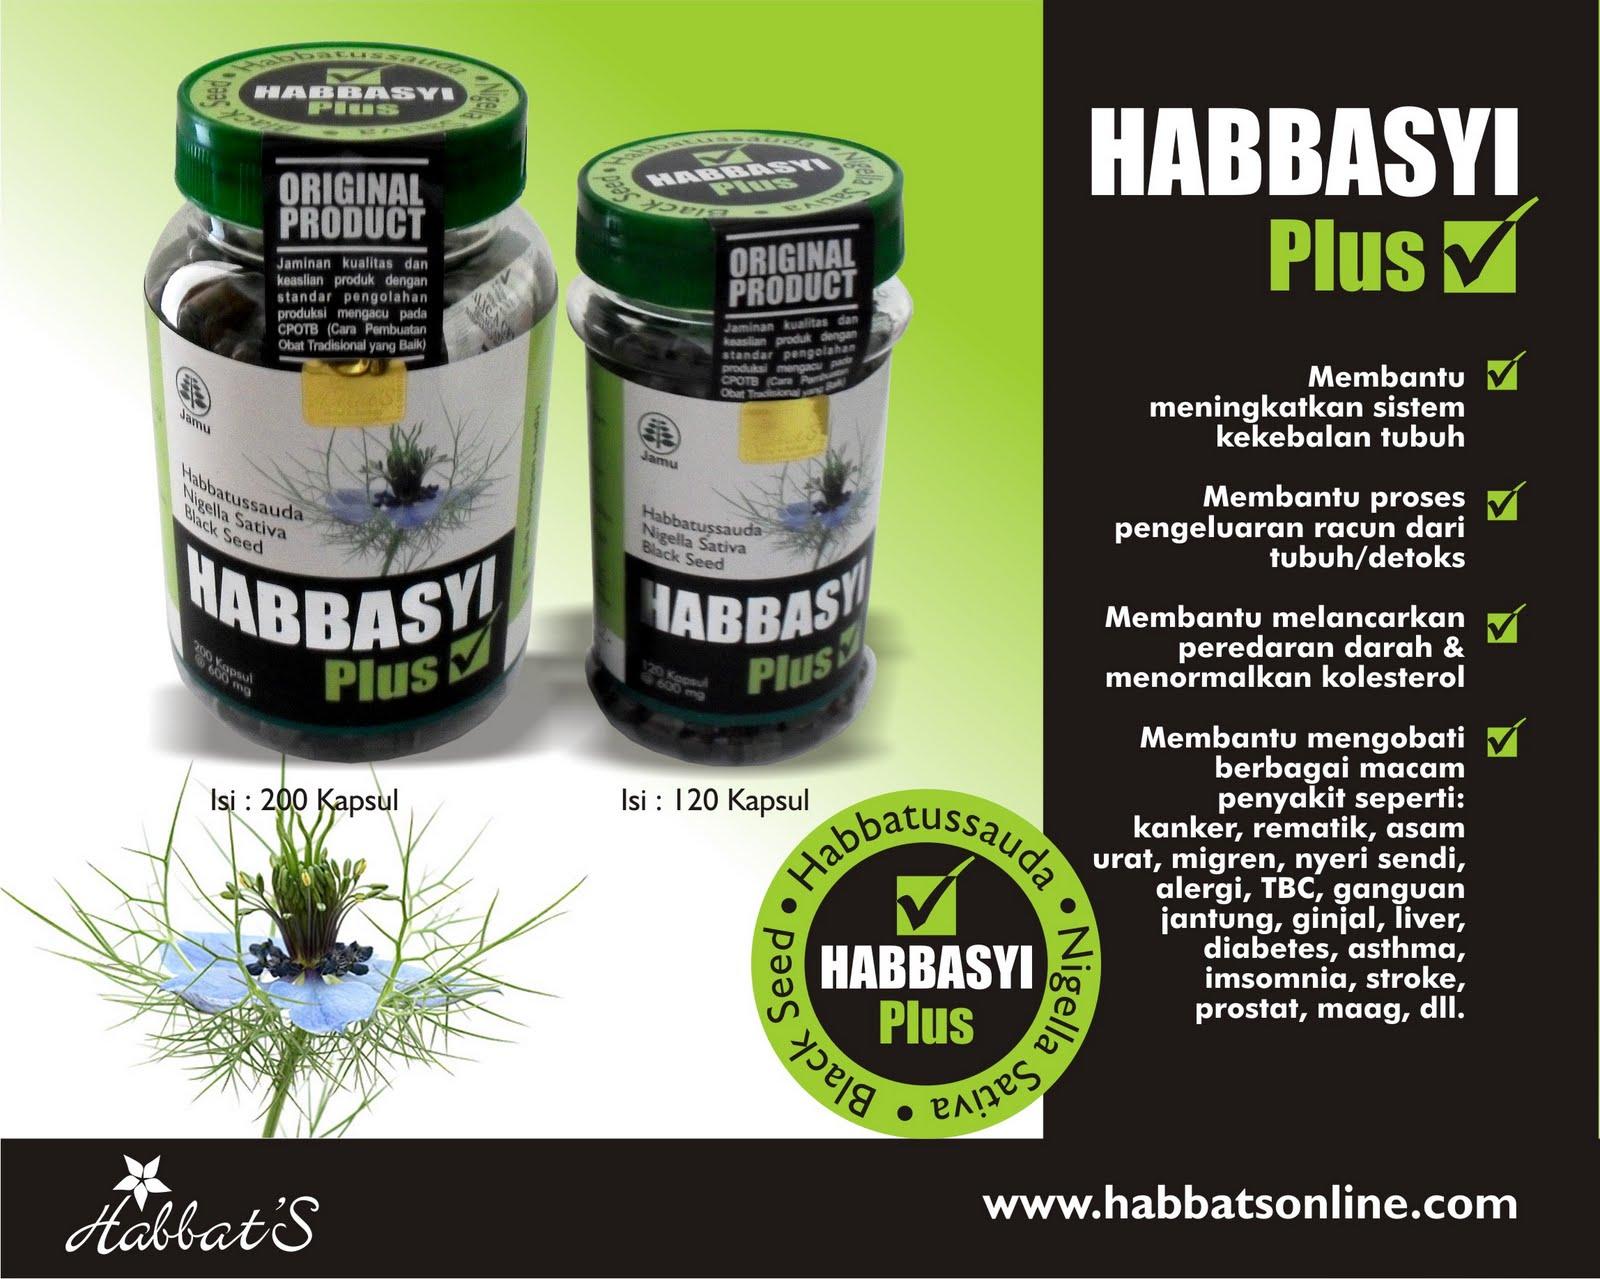 Habbats International Grosir Surabaya Produsen Habbatussauda Minyak Nigellive Oil Isi 200 Kapsul